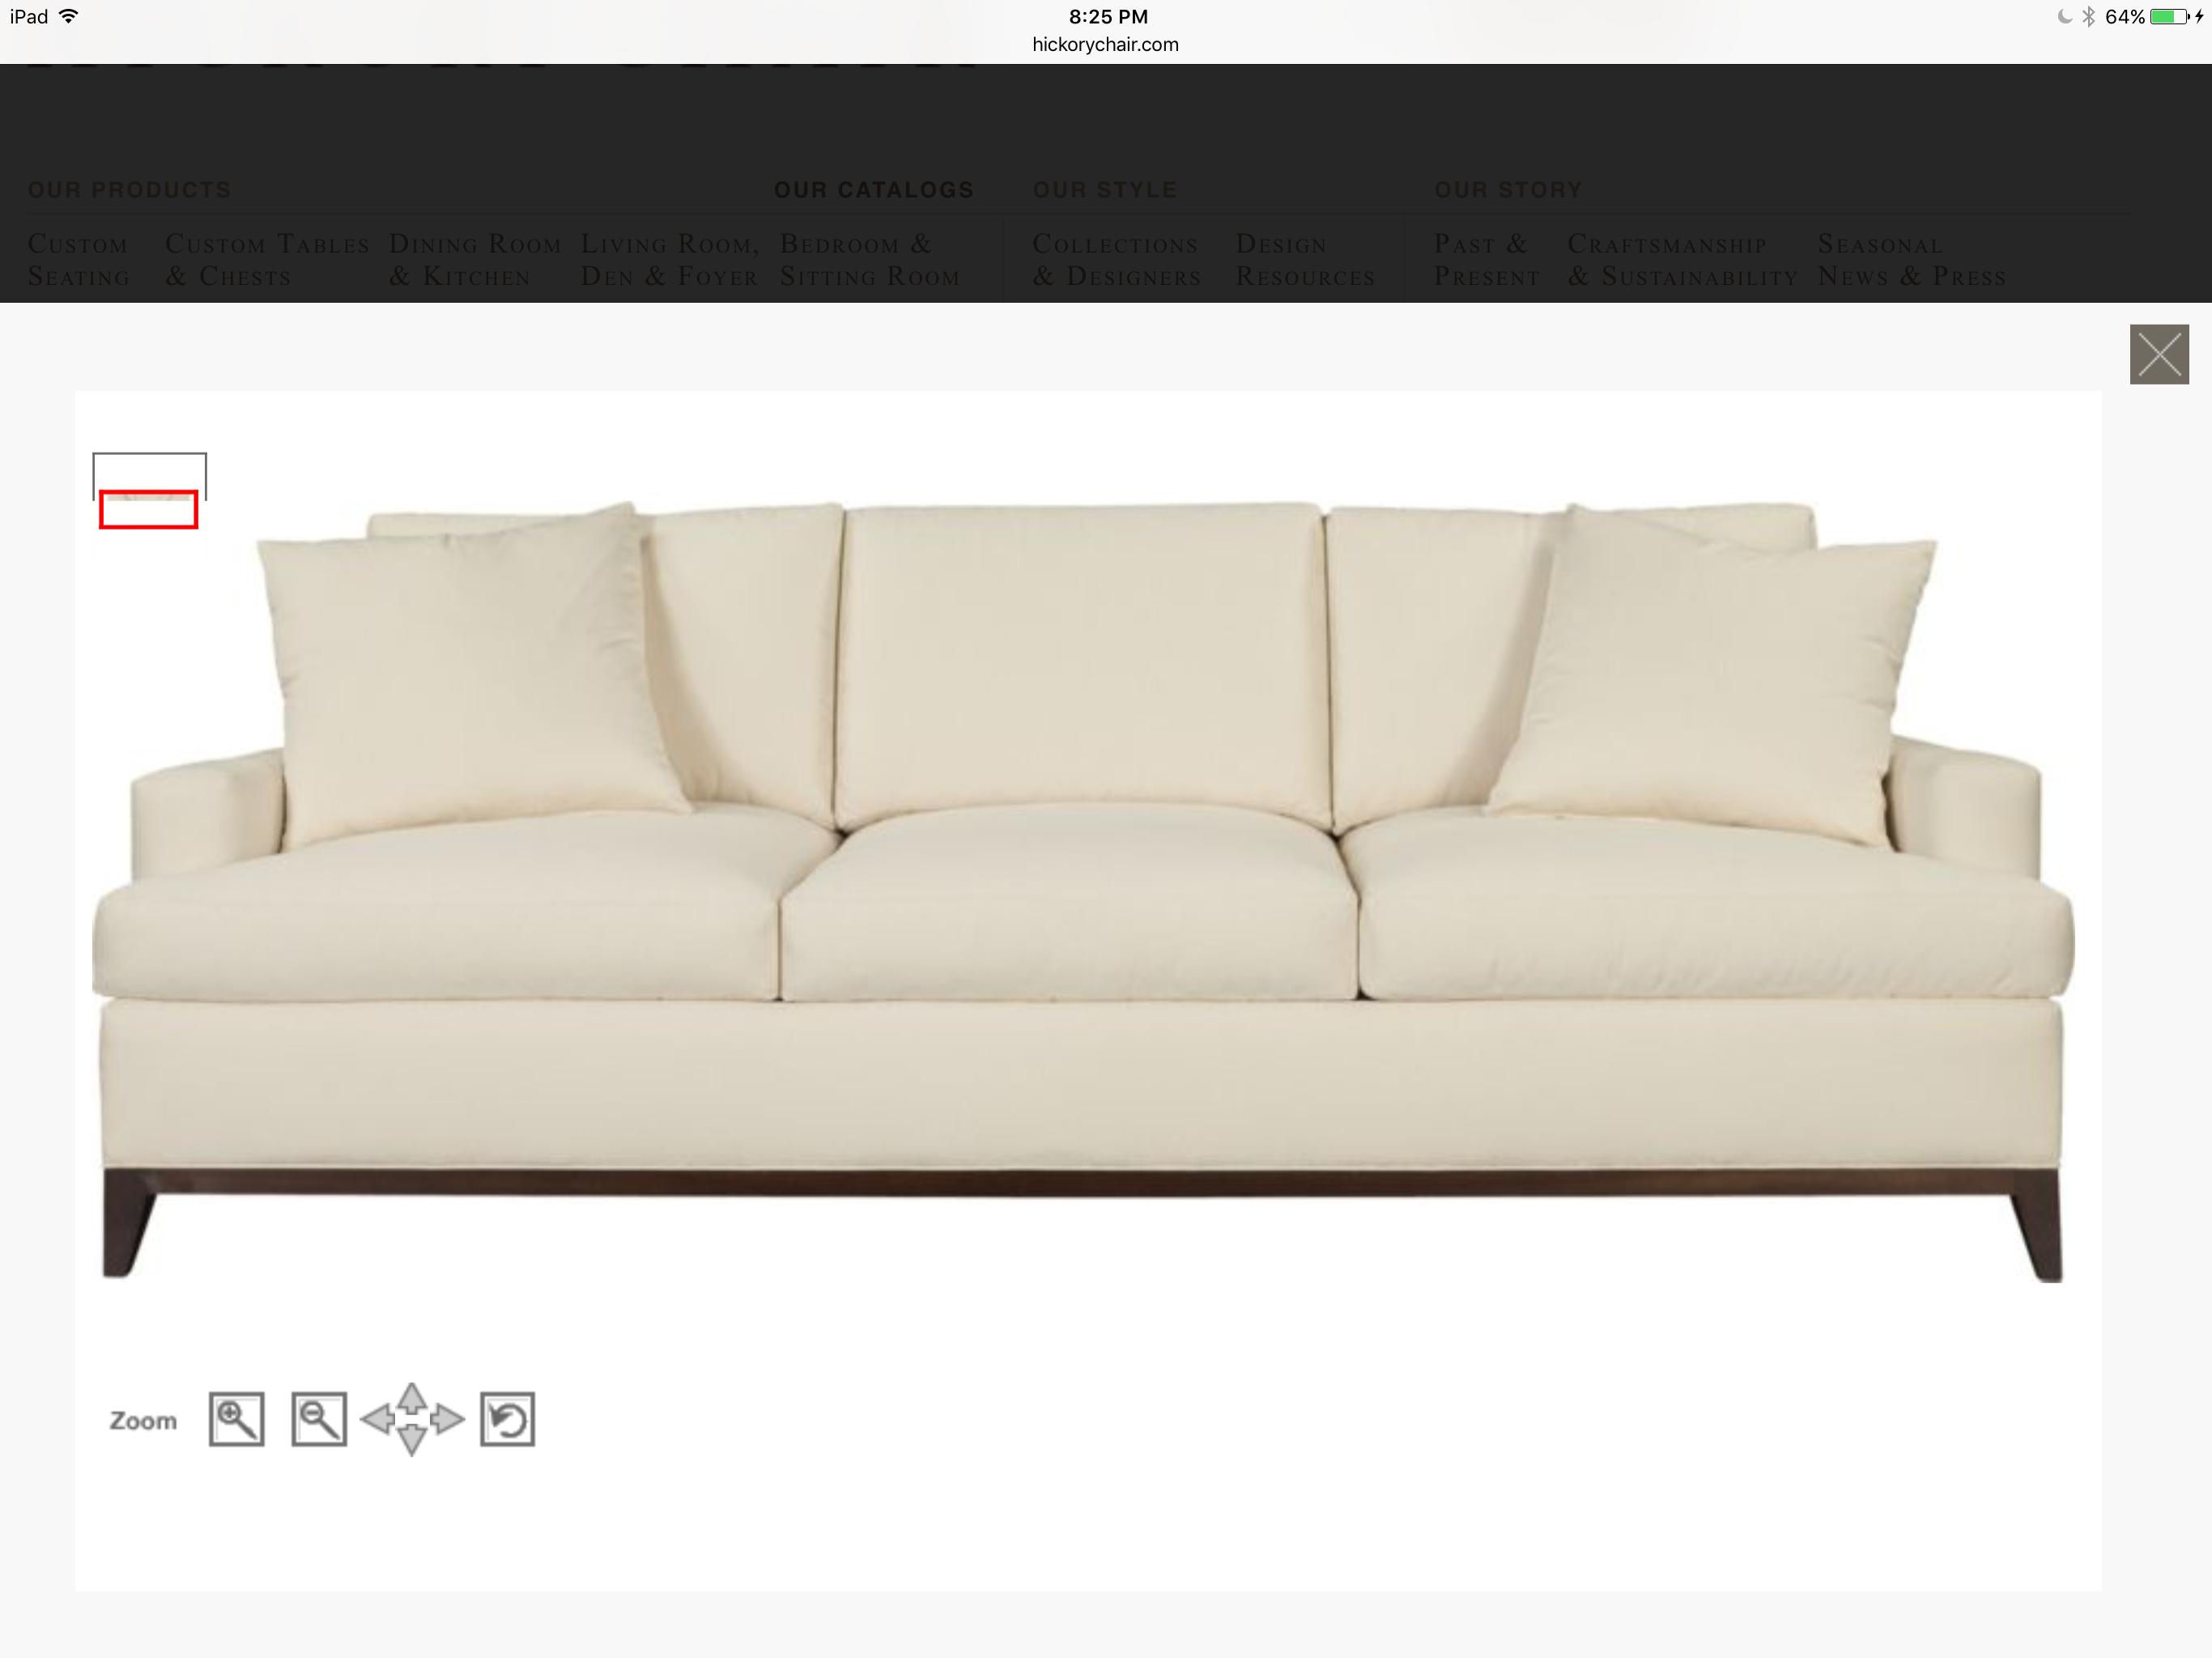 Sofa at Country Design Sofa, Hickory chair, Living room